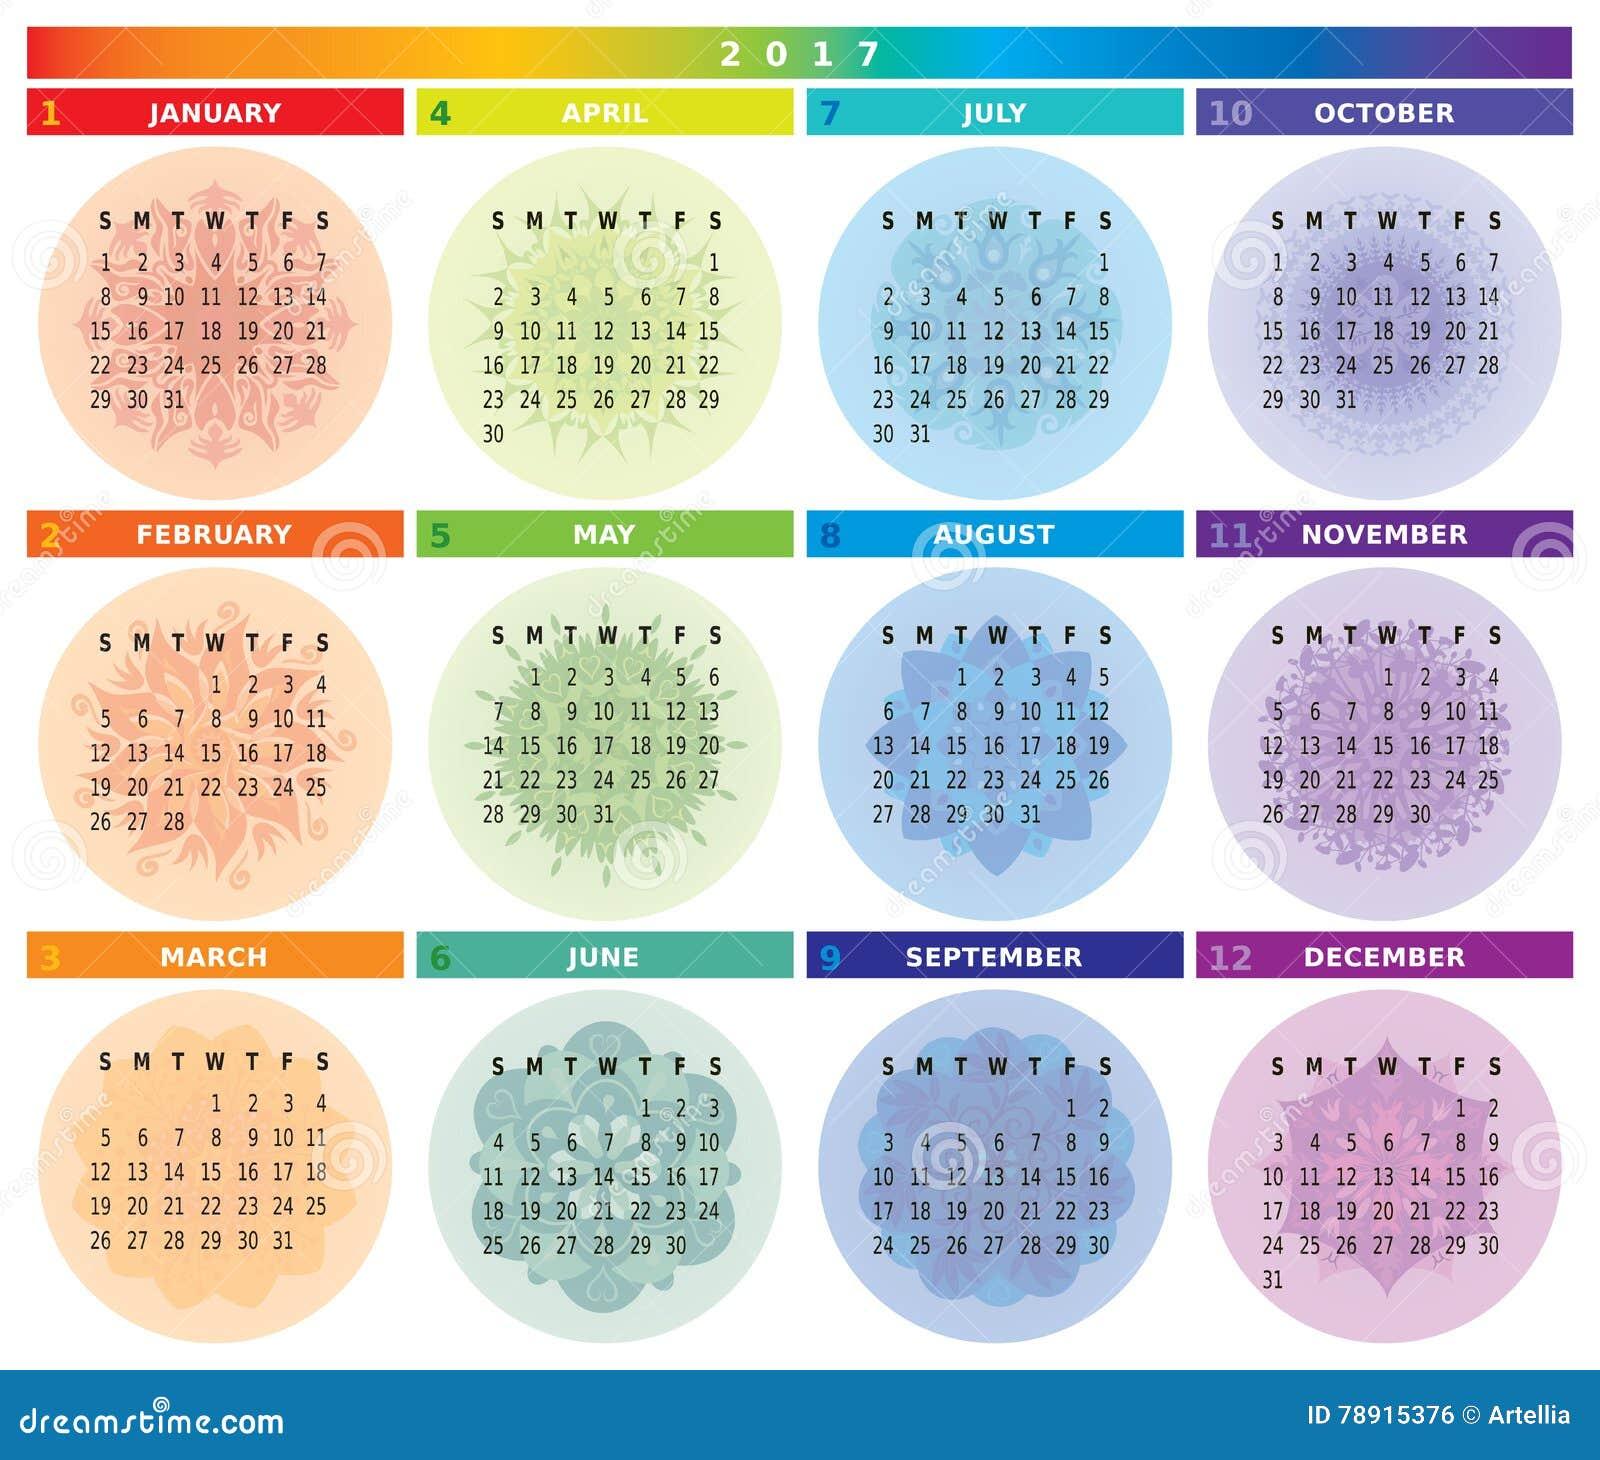 Calendario Rainbow.2017 Calendar With Mandalas In Light Rainbow Colors Stock